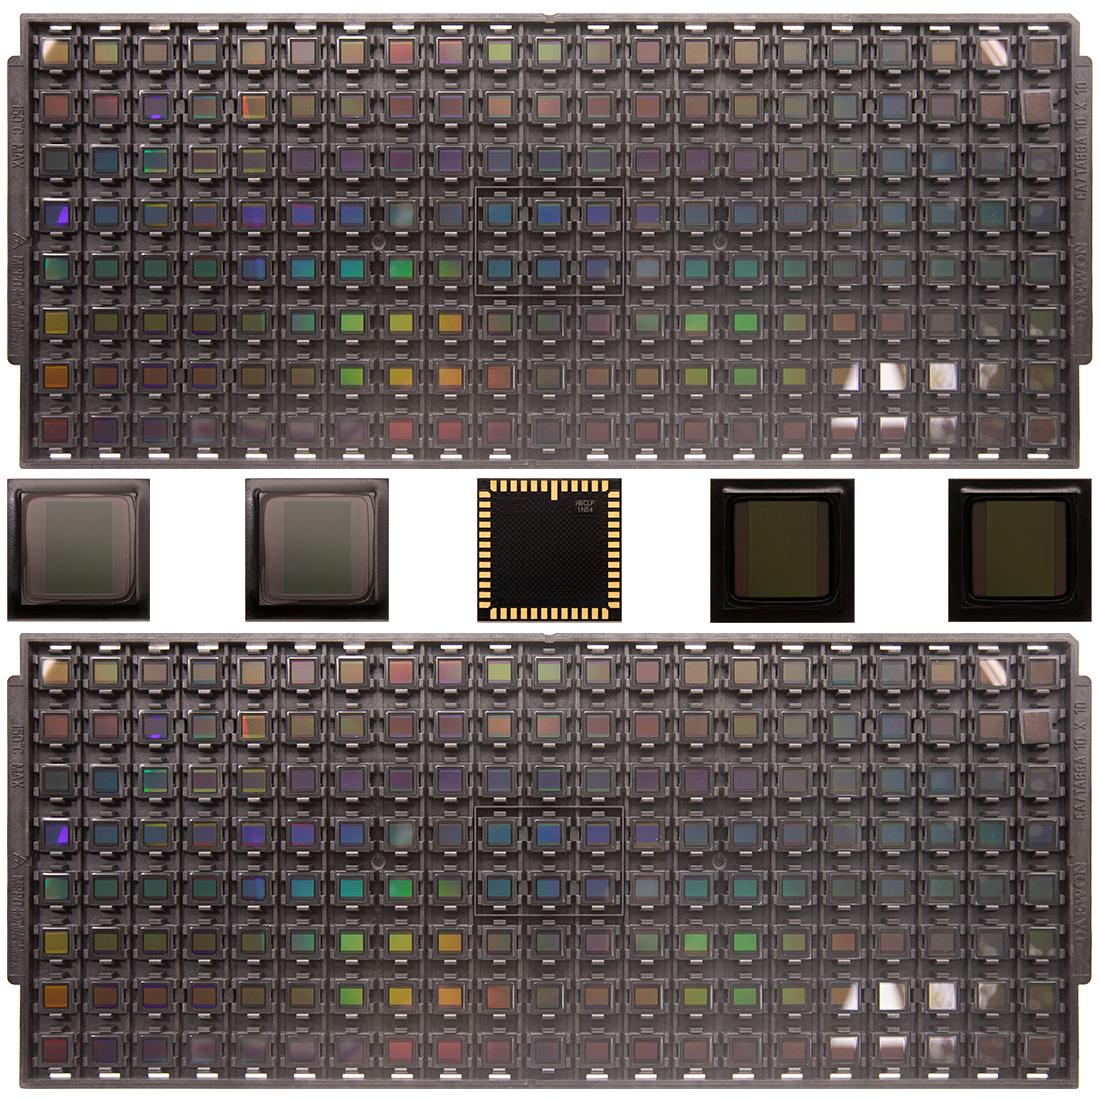 HBCLP, ONSEMI工业相机图像传感器,1/2.3-INCH CMOS SENSOR